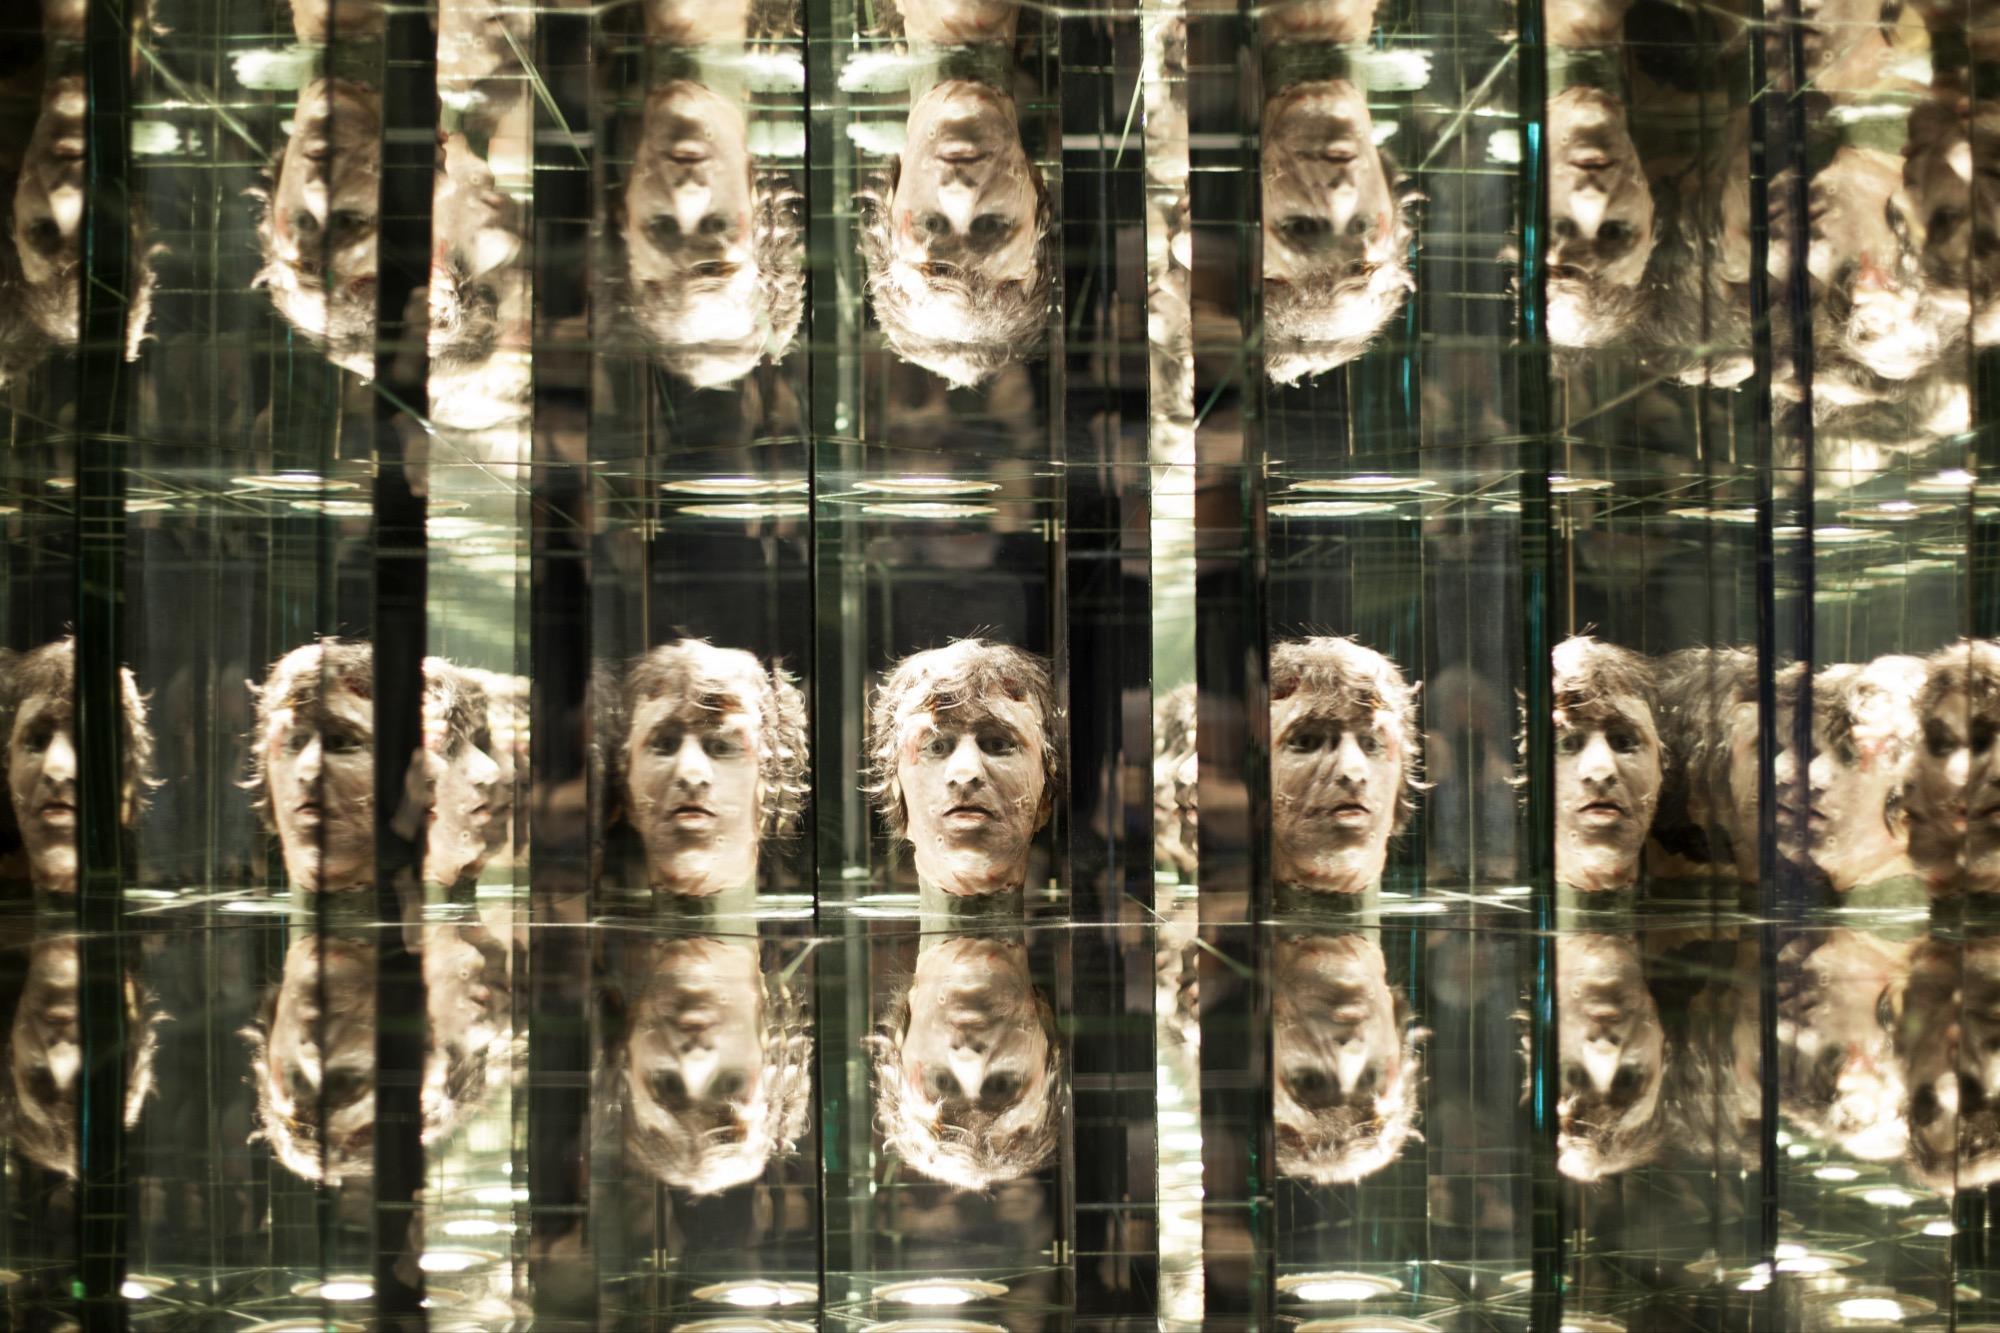 David Altmejd 111115 22 - Photo by Poul Buchard - Brondum and Co - Courtesy Louisiana Museum of Modern Art, Denmark.jpg